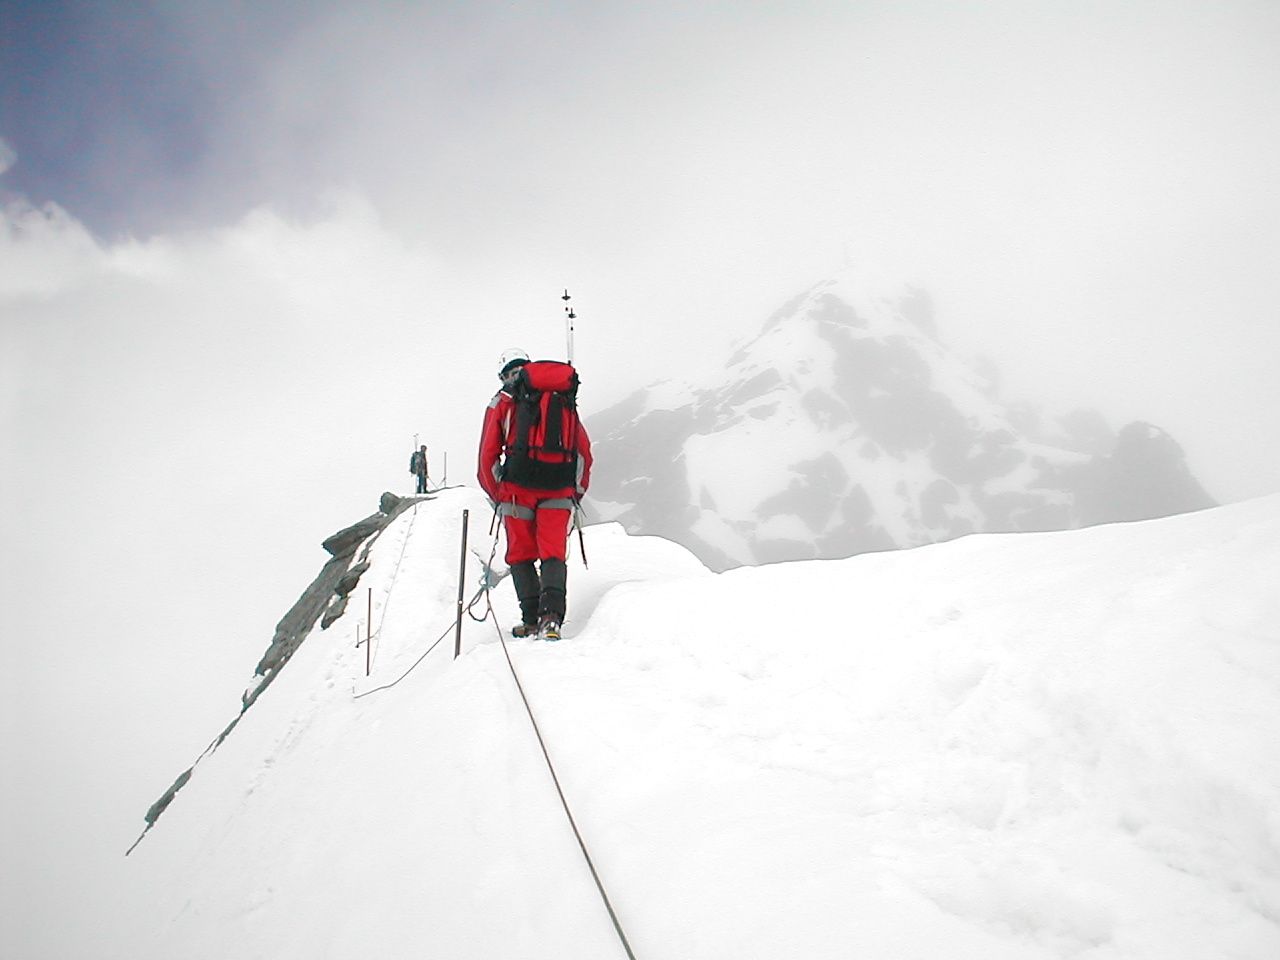 Randění s horolezcem